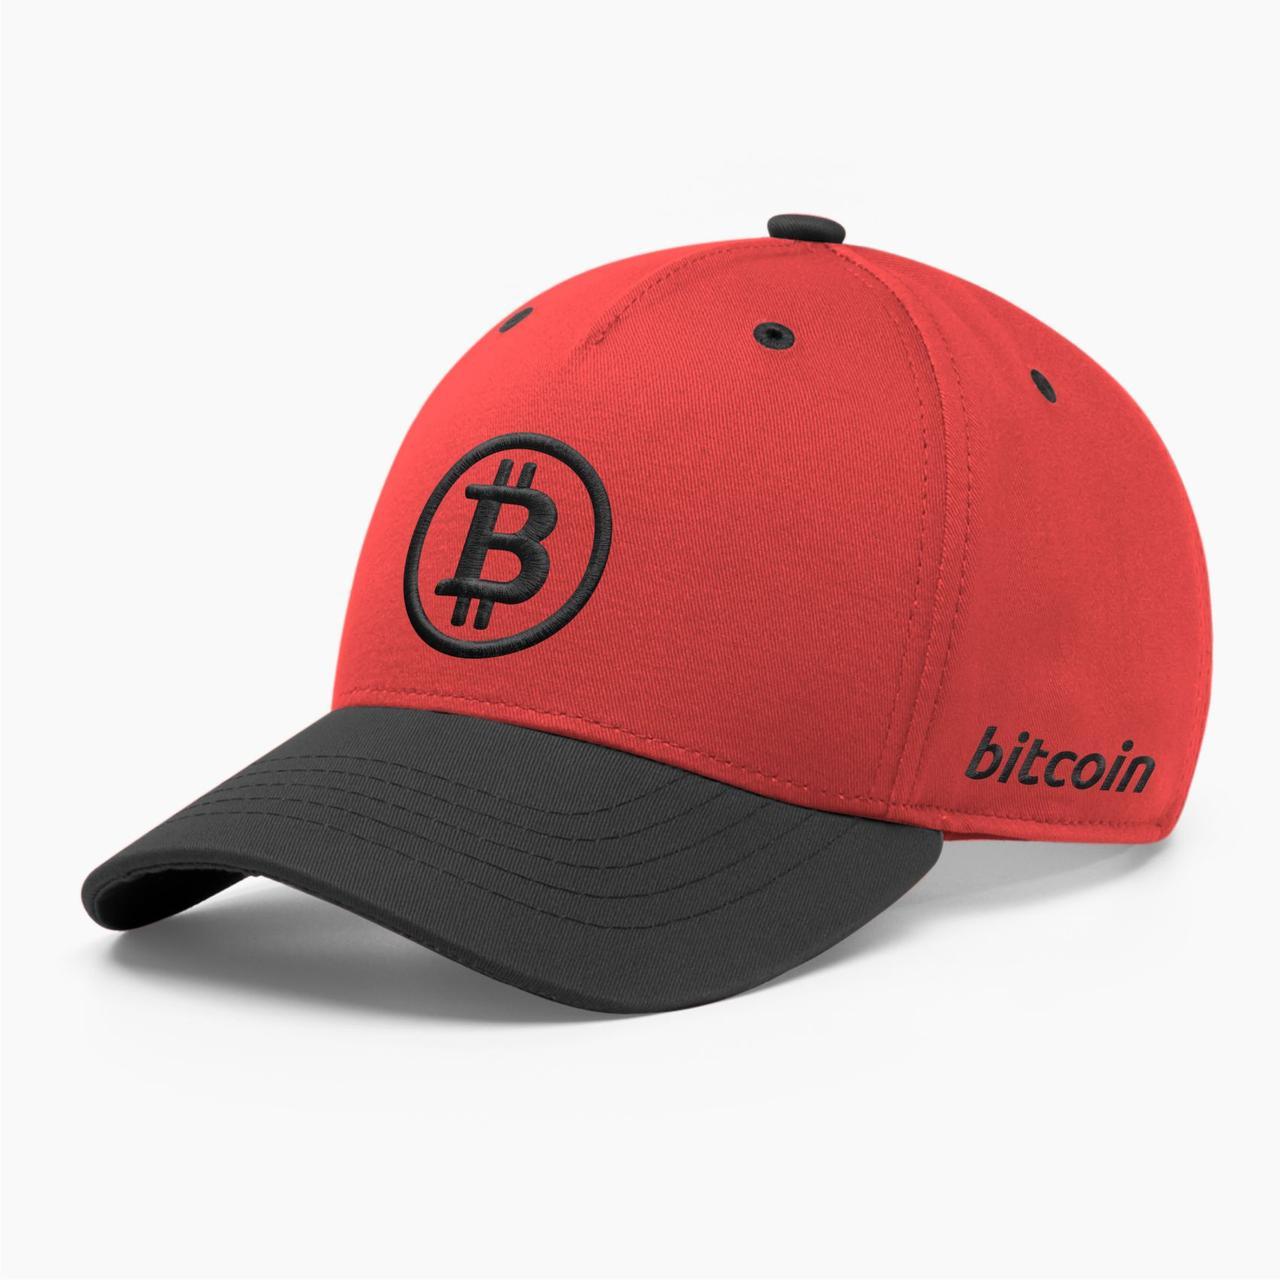 Кепка бейсболка INAL Биткоин Bitcoin BTC S / 53-54 RU Красный 11553